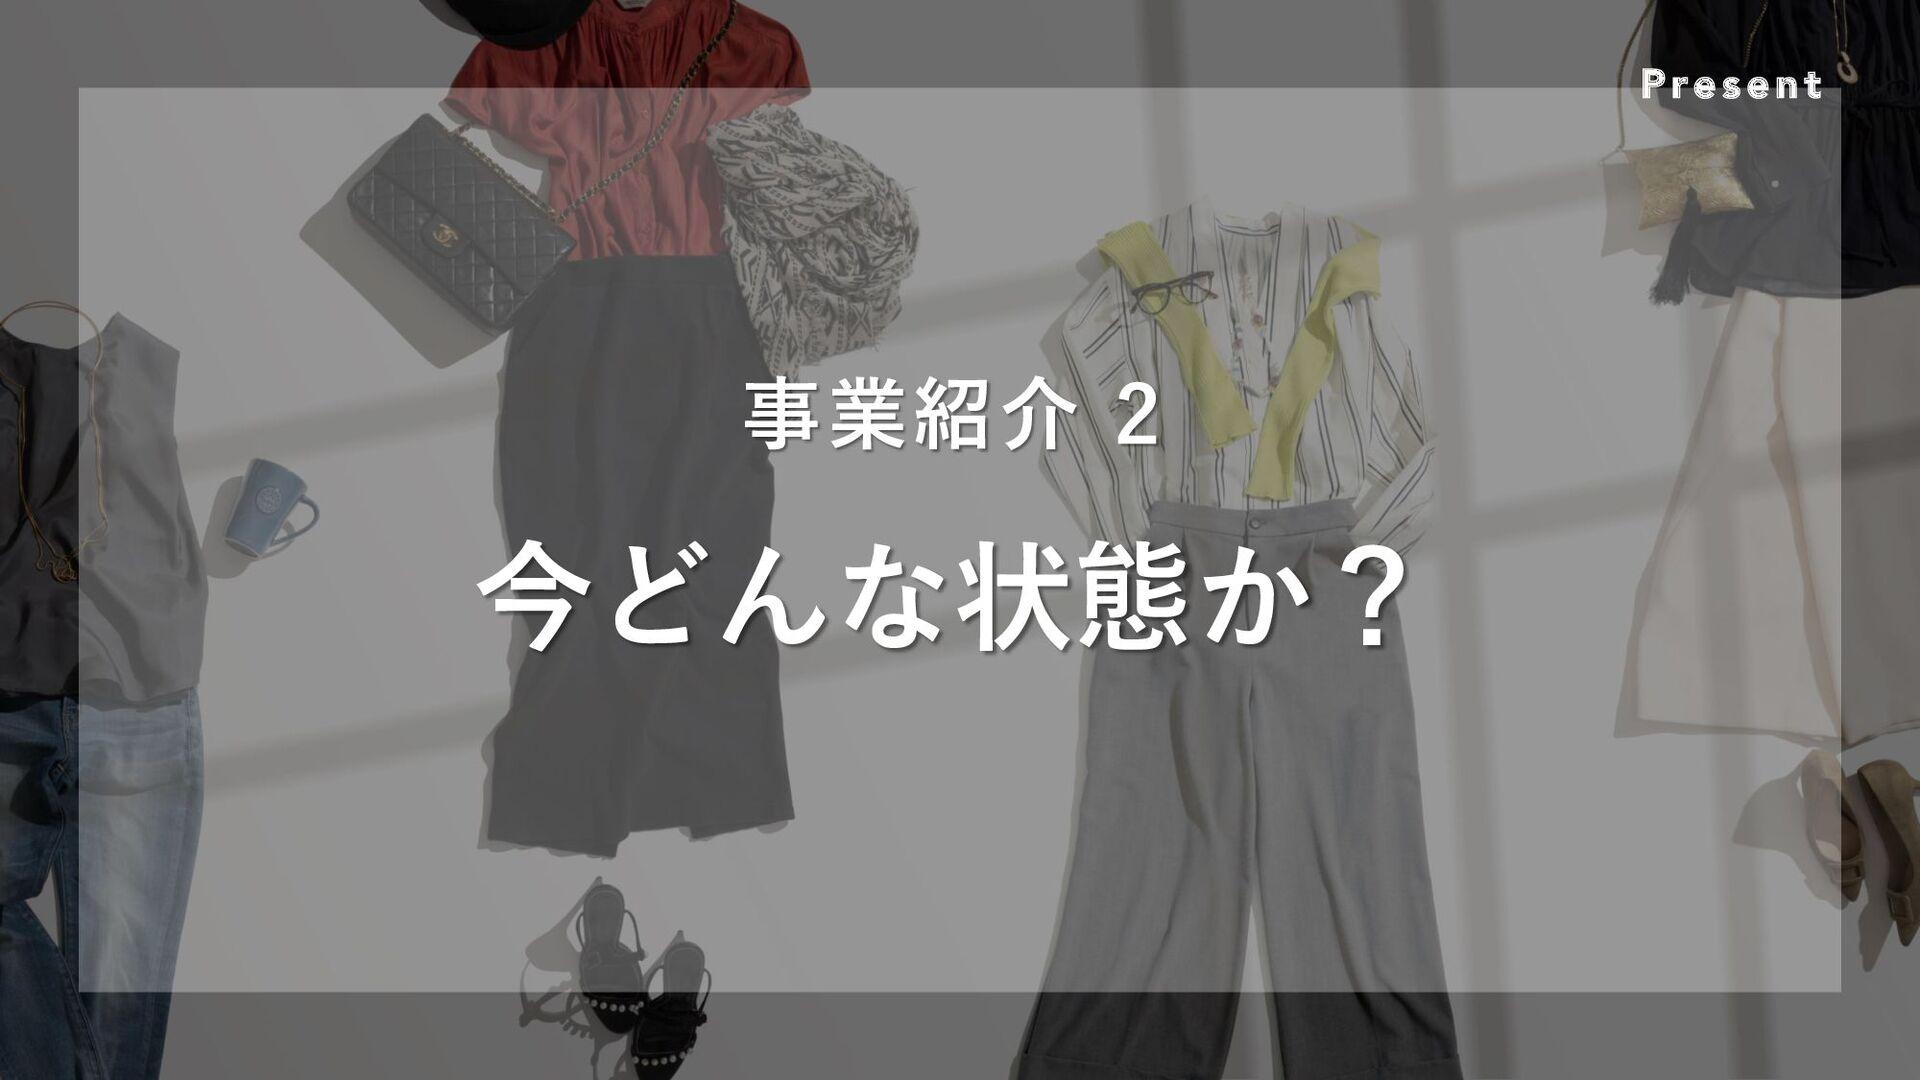 Present 事業紹介 2 今どんな状態か?